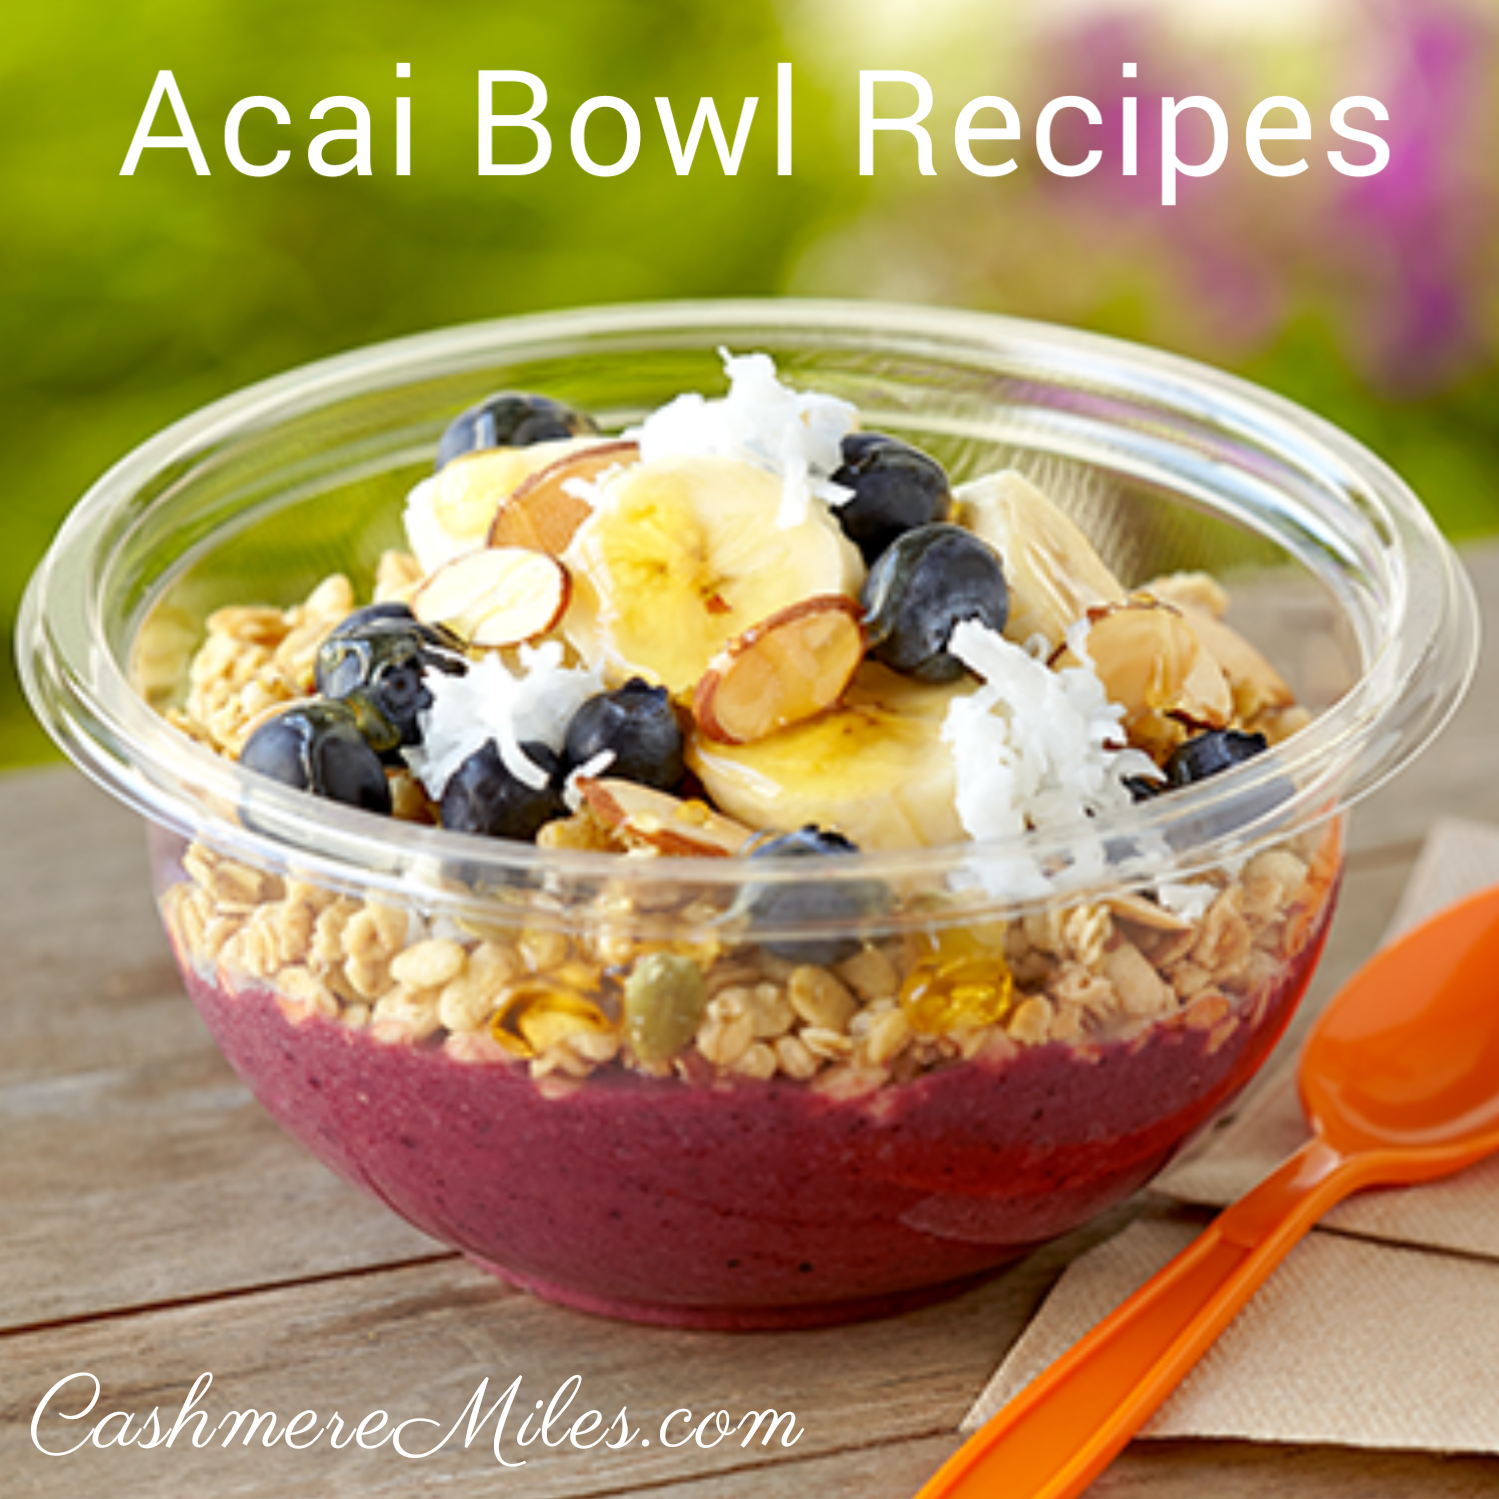 Acai Bowls And Why Social Media Is Not Bad Acai Bowls Recipe Jamba Juice Recipes